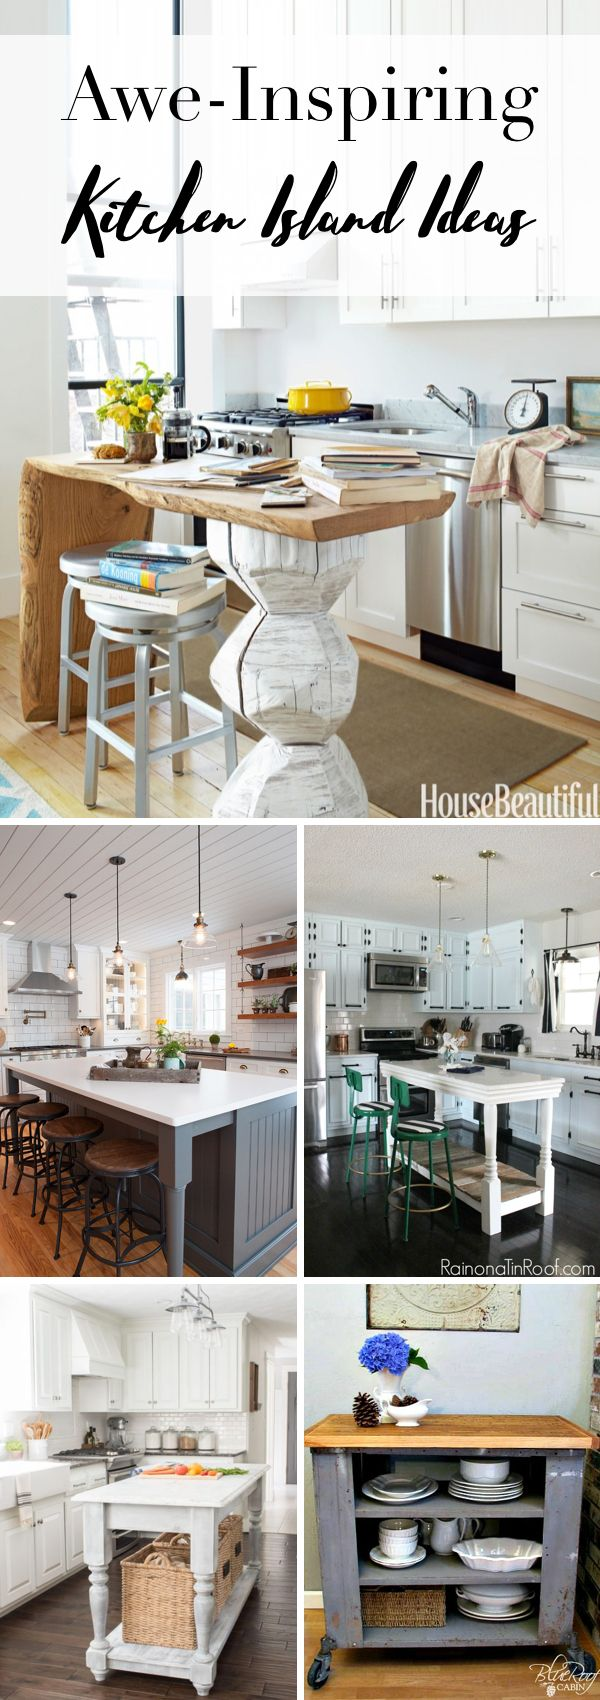 25 Awe-Inspiring Kitchen Island Ideas Blending Beauty with Purpose!